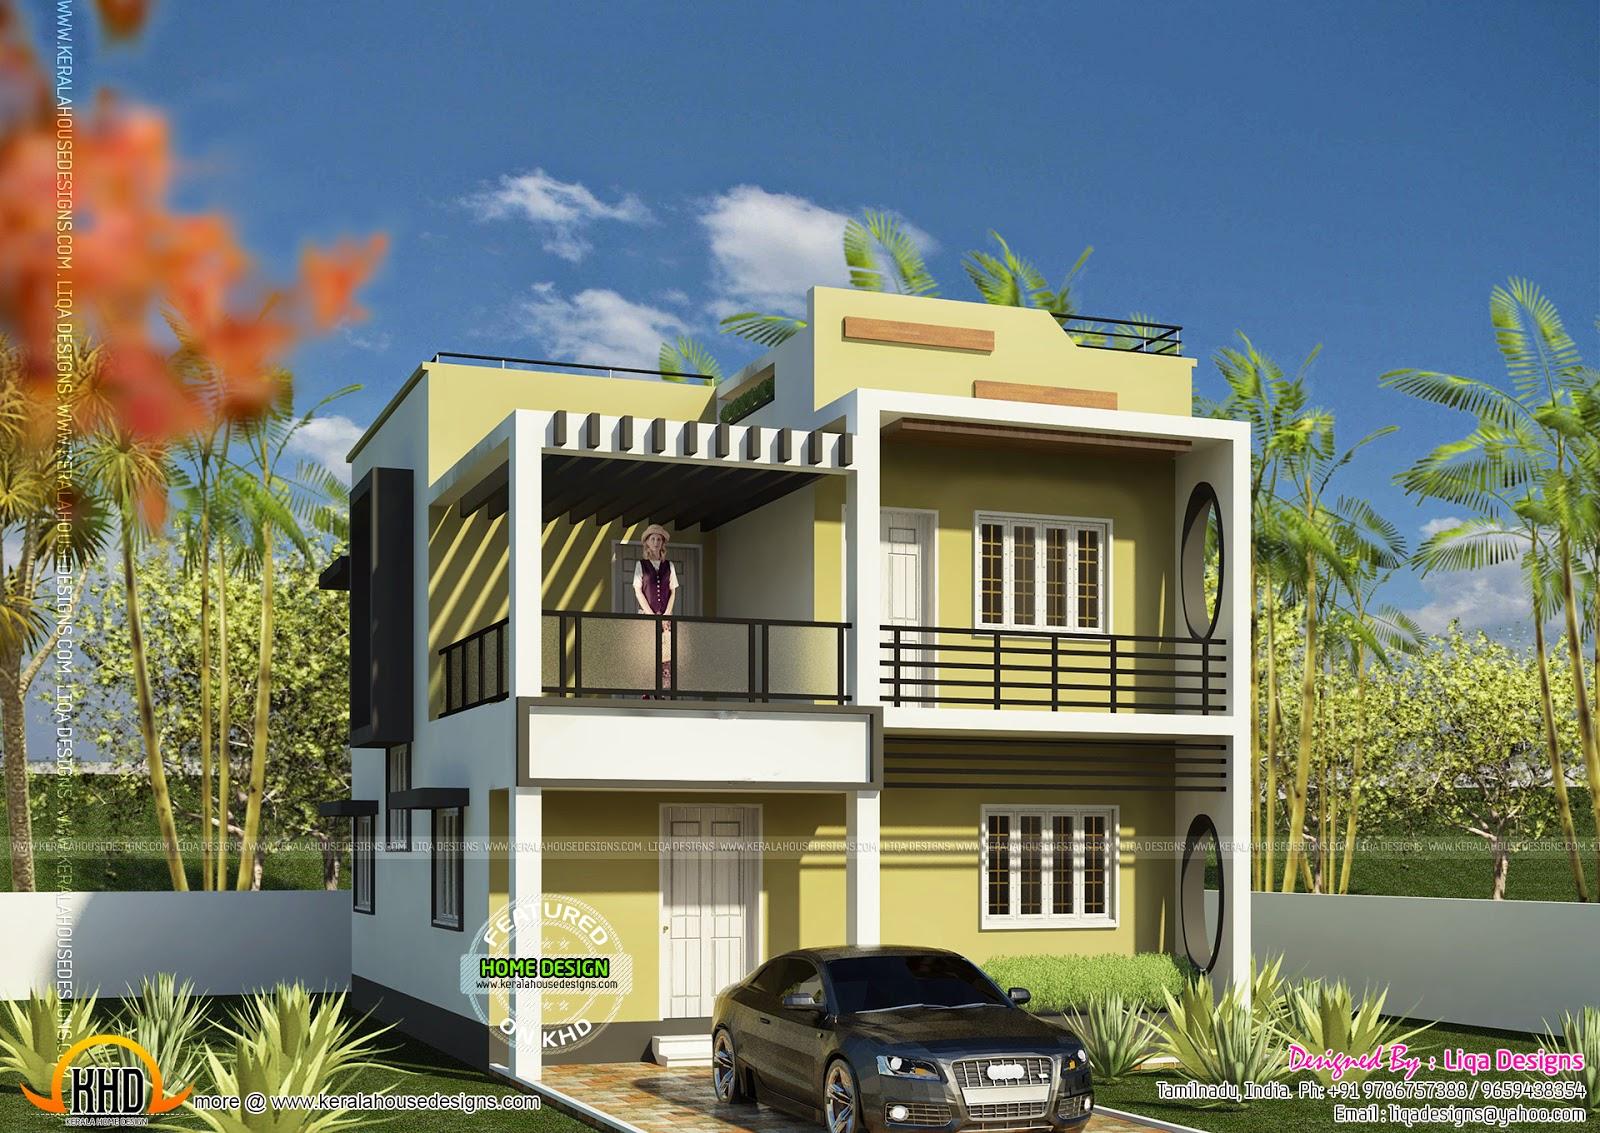 1872 Square Feet 4 Bedroom House Kerala Home Design Bloglovin'